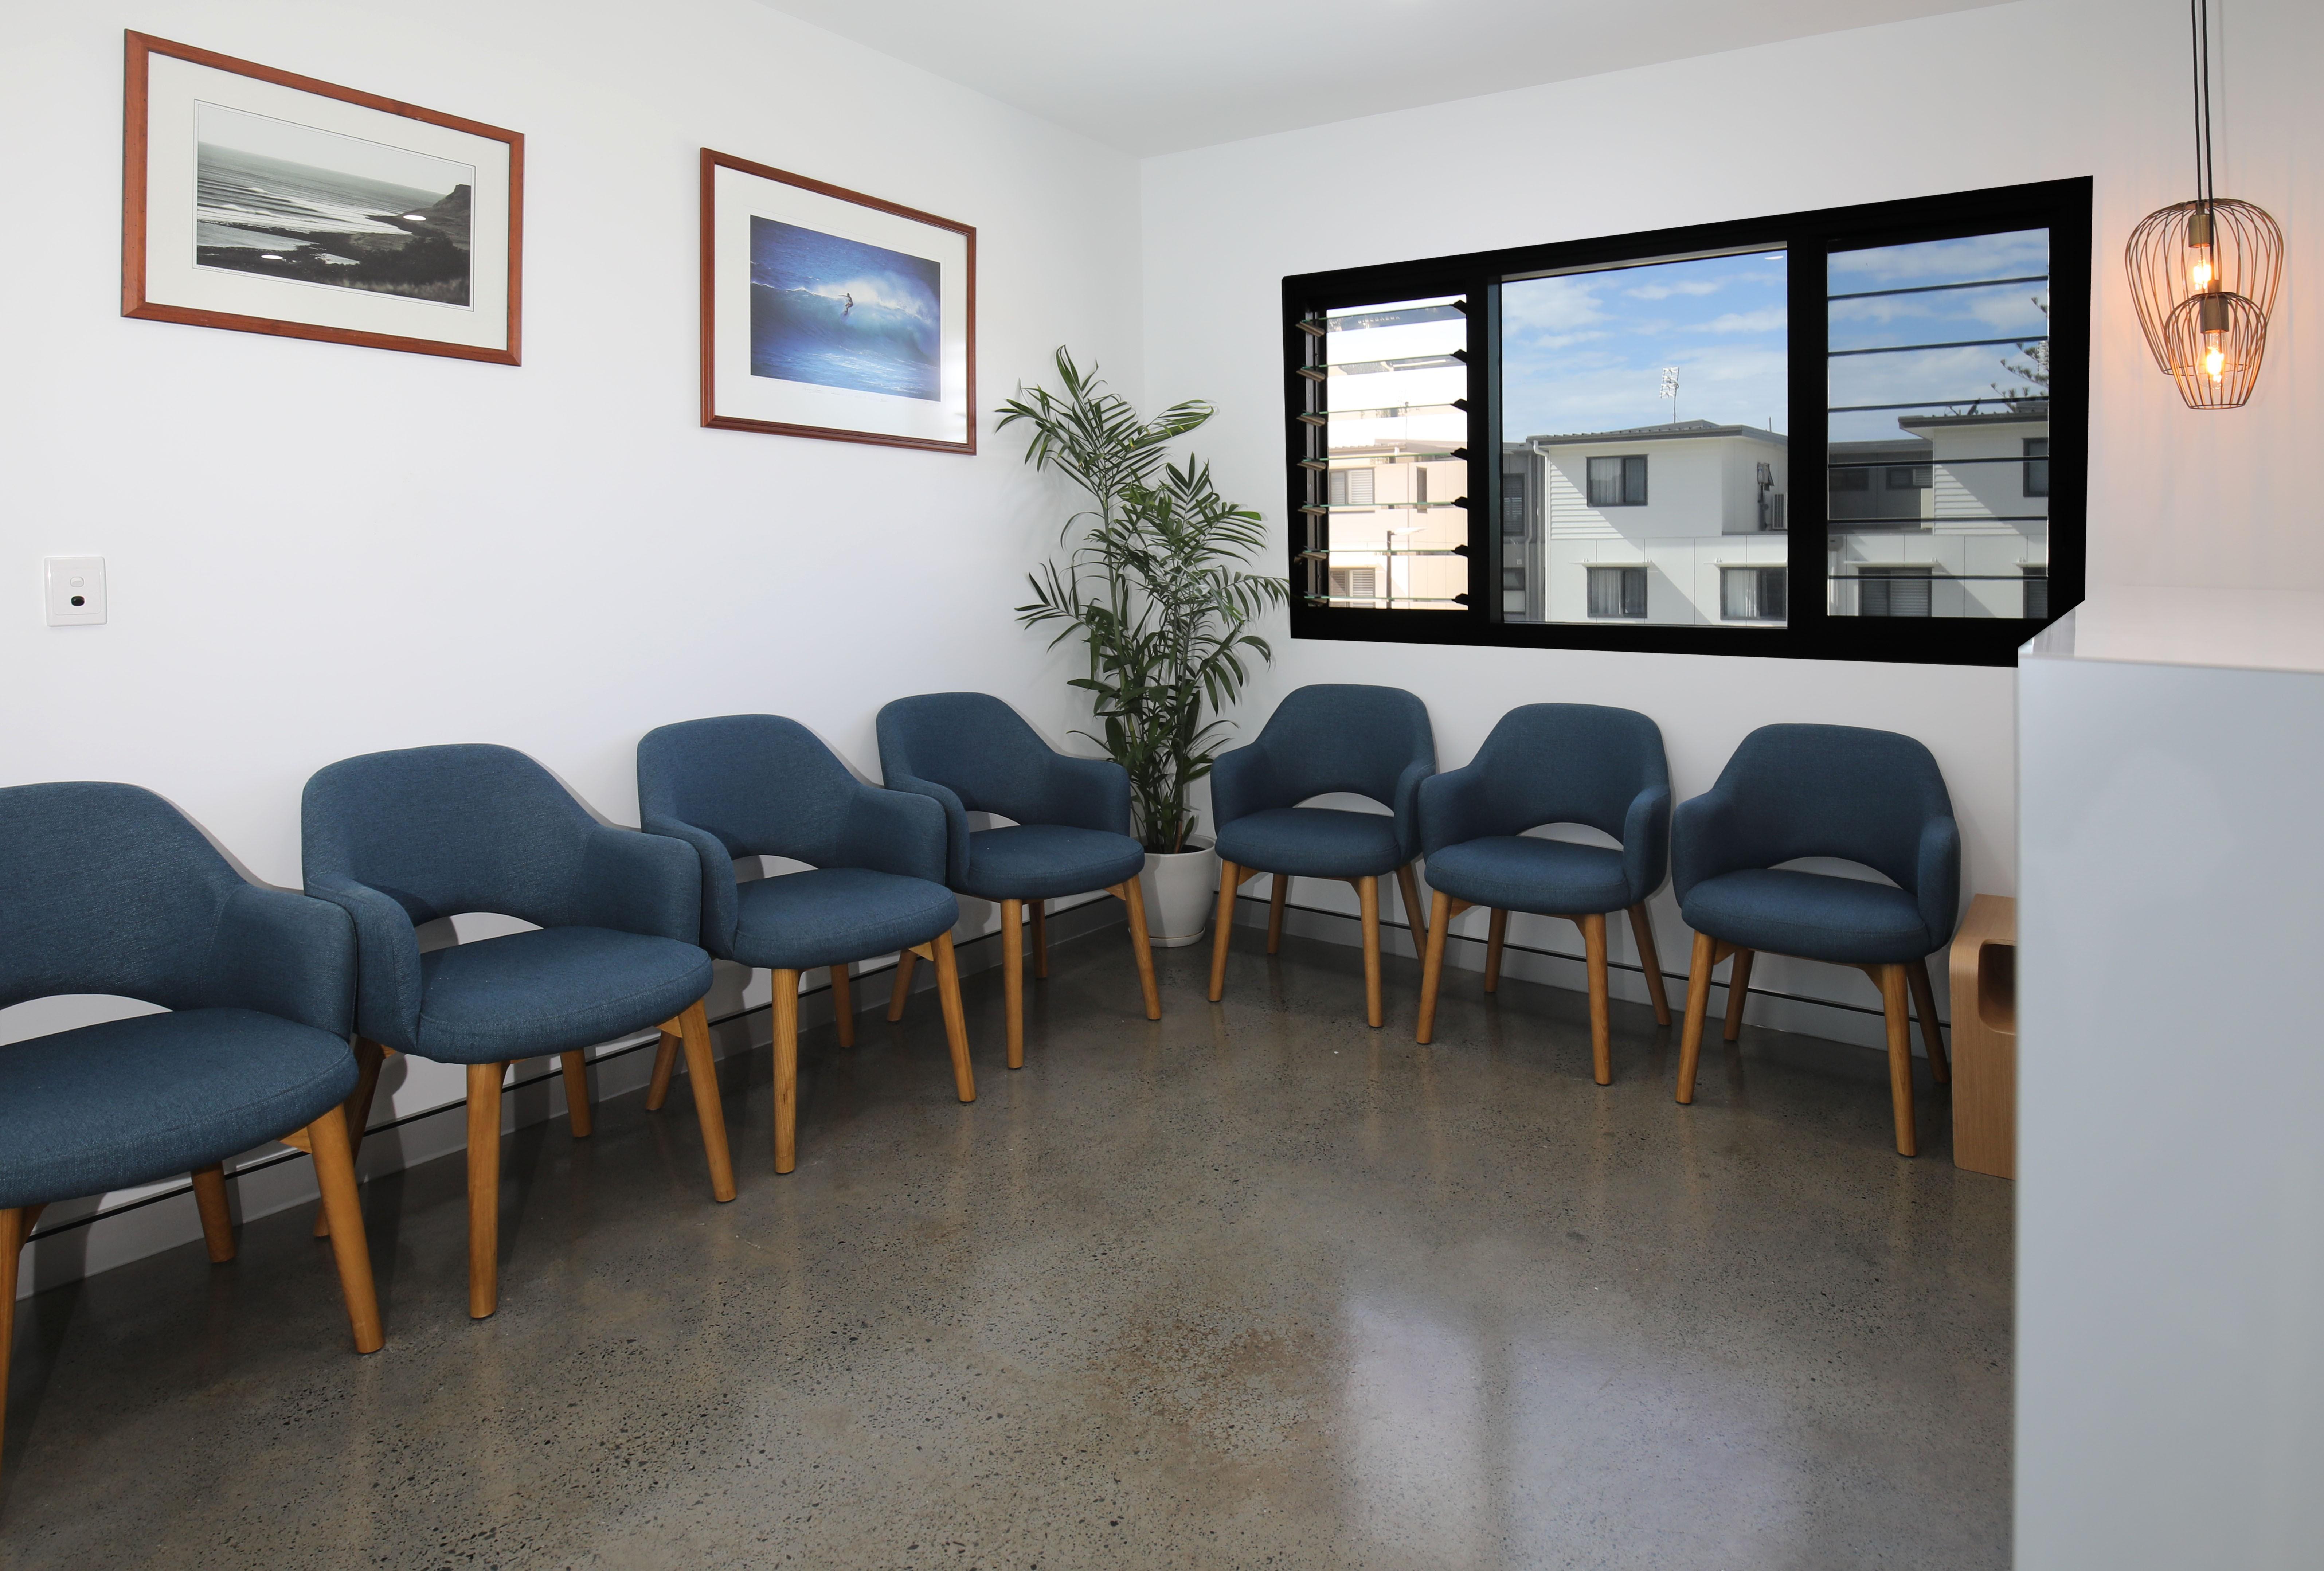 1waiting room